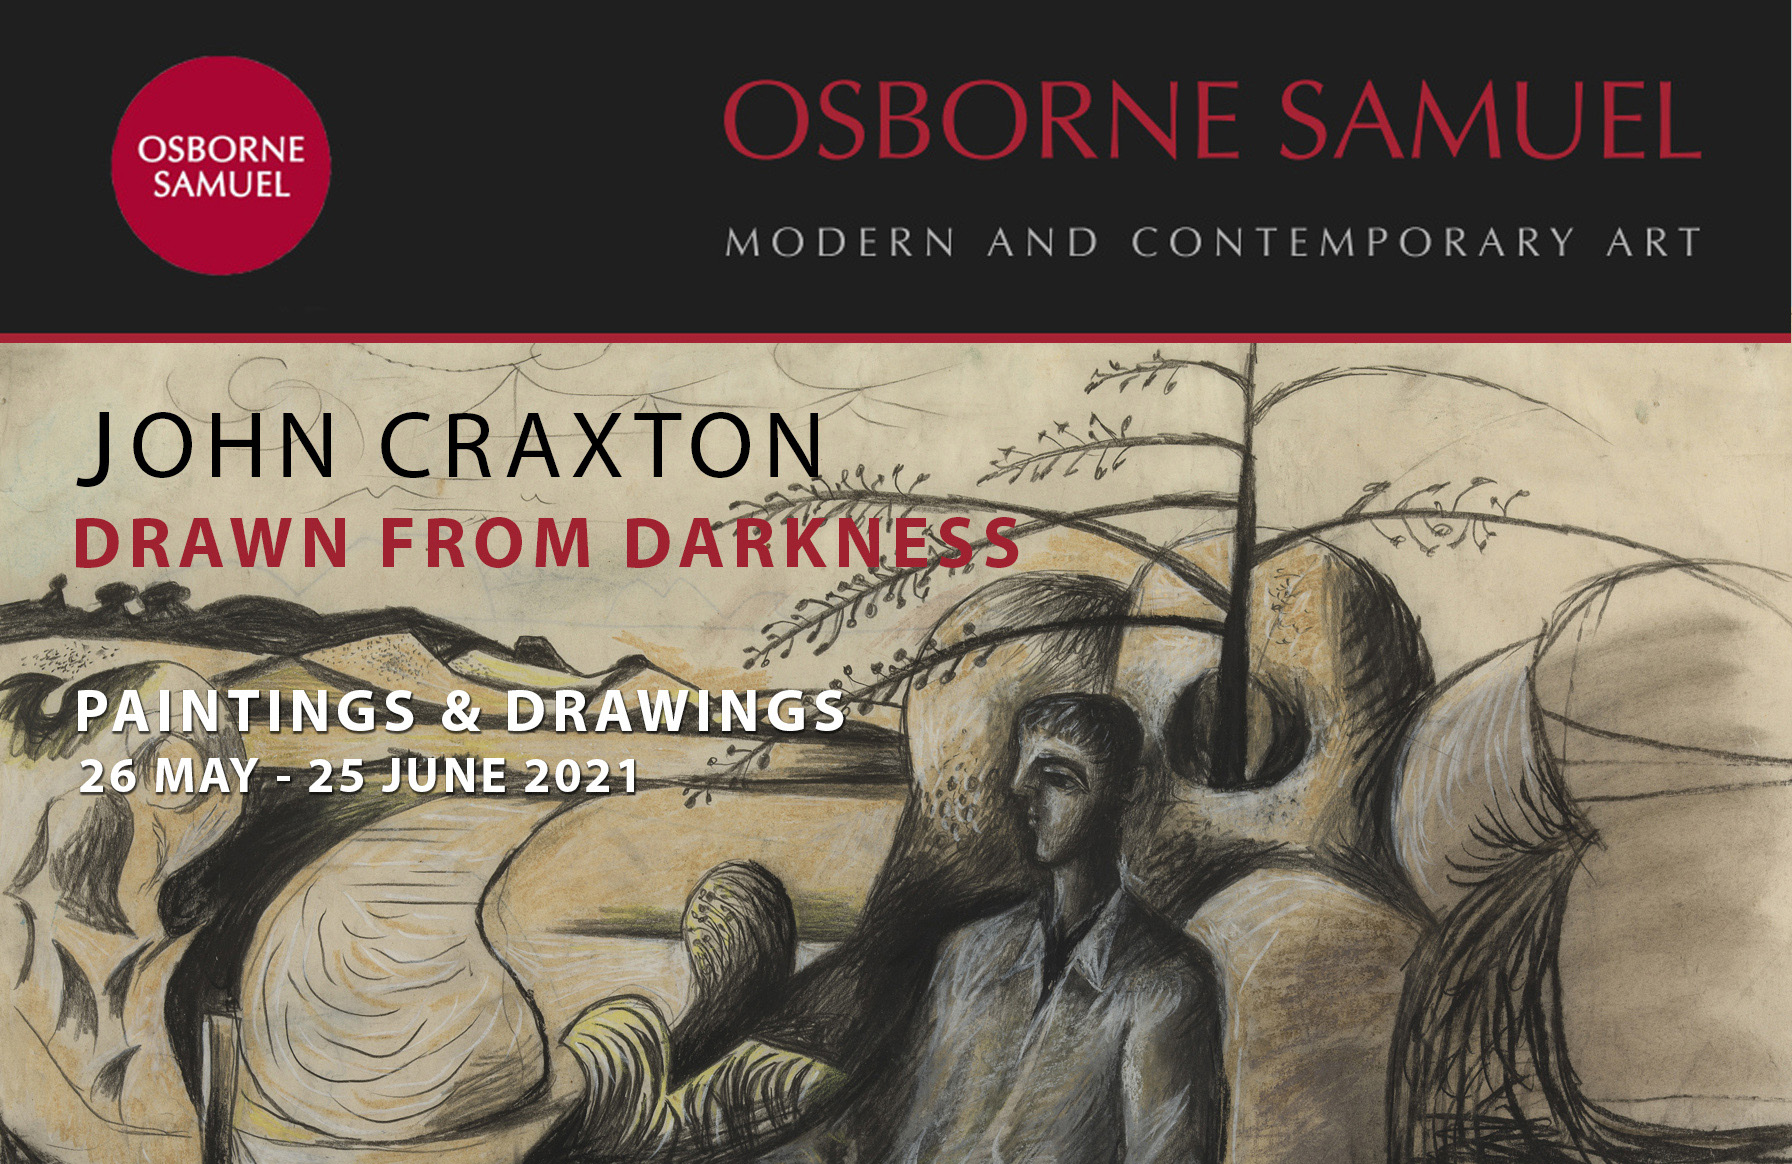 John Craxton Exhibition Newsletter